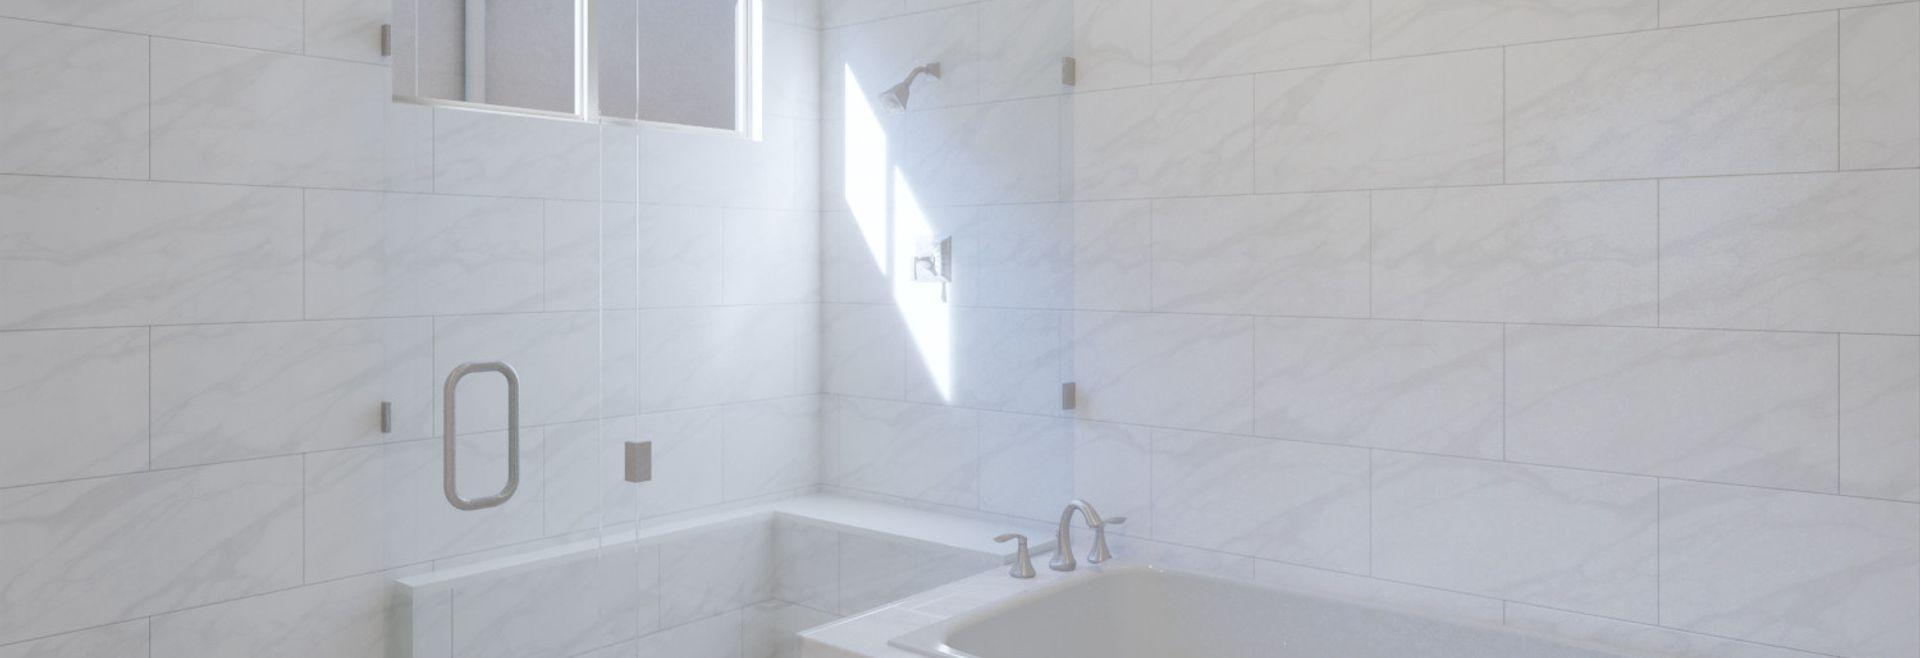 Trilogy Summerlin Radiant Virtually Staged Master Bath